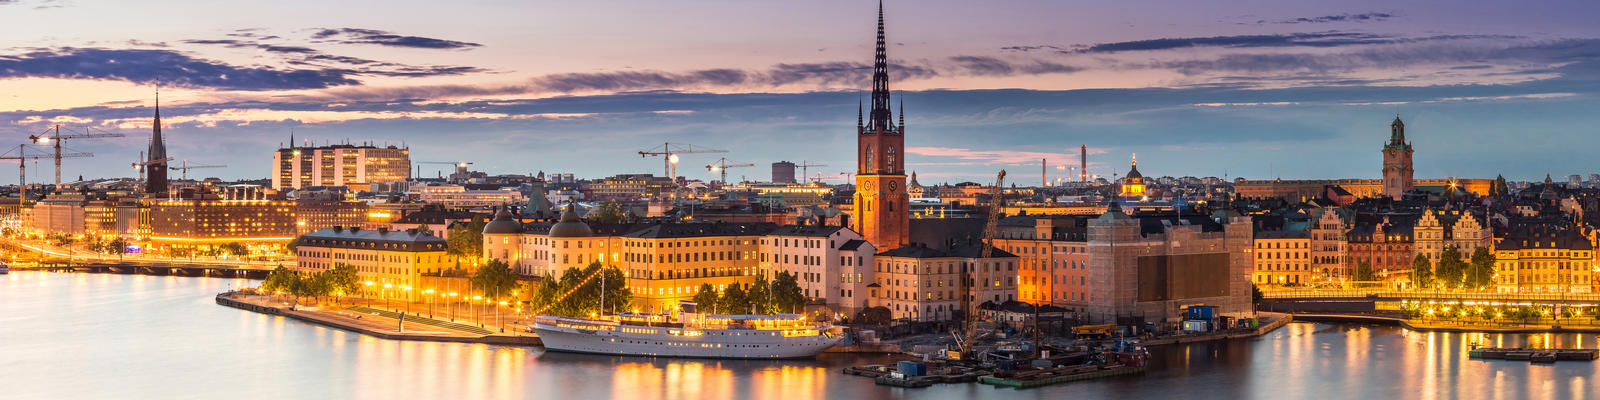 Stockholm, Sweden (Photo:  S-F/Shutterstock)